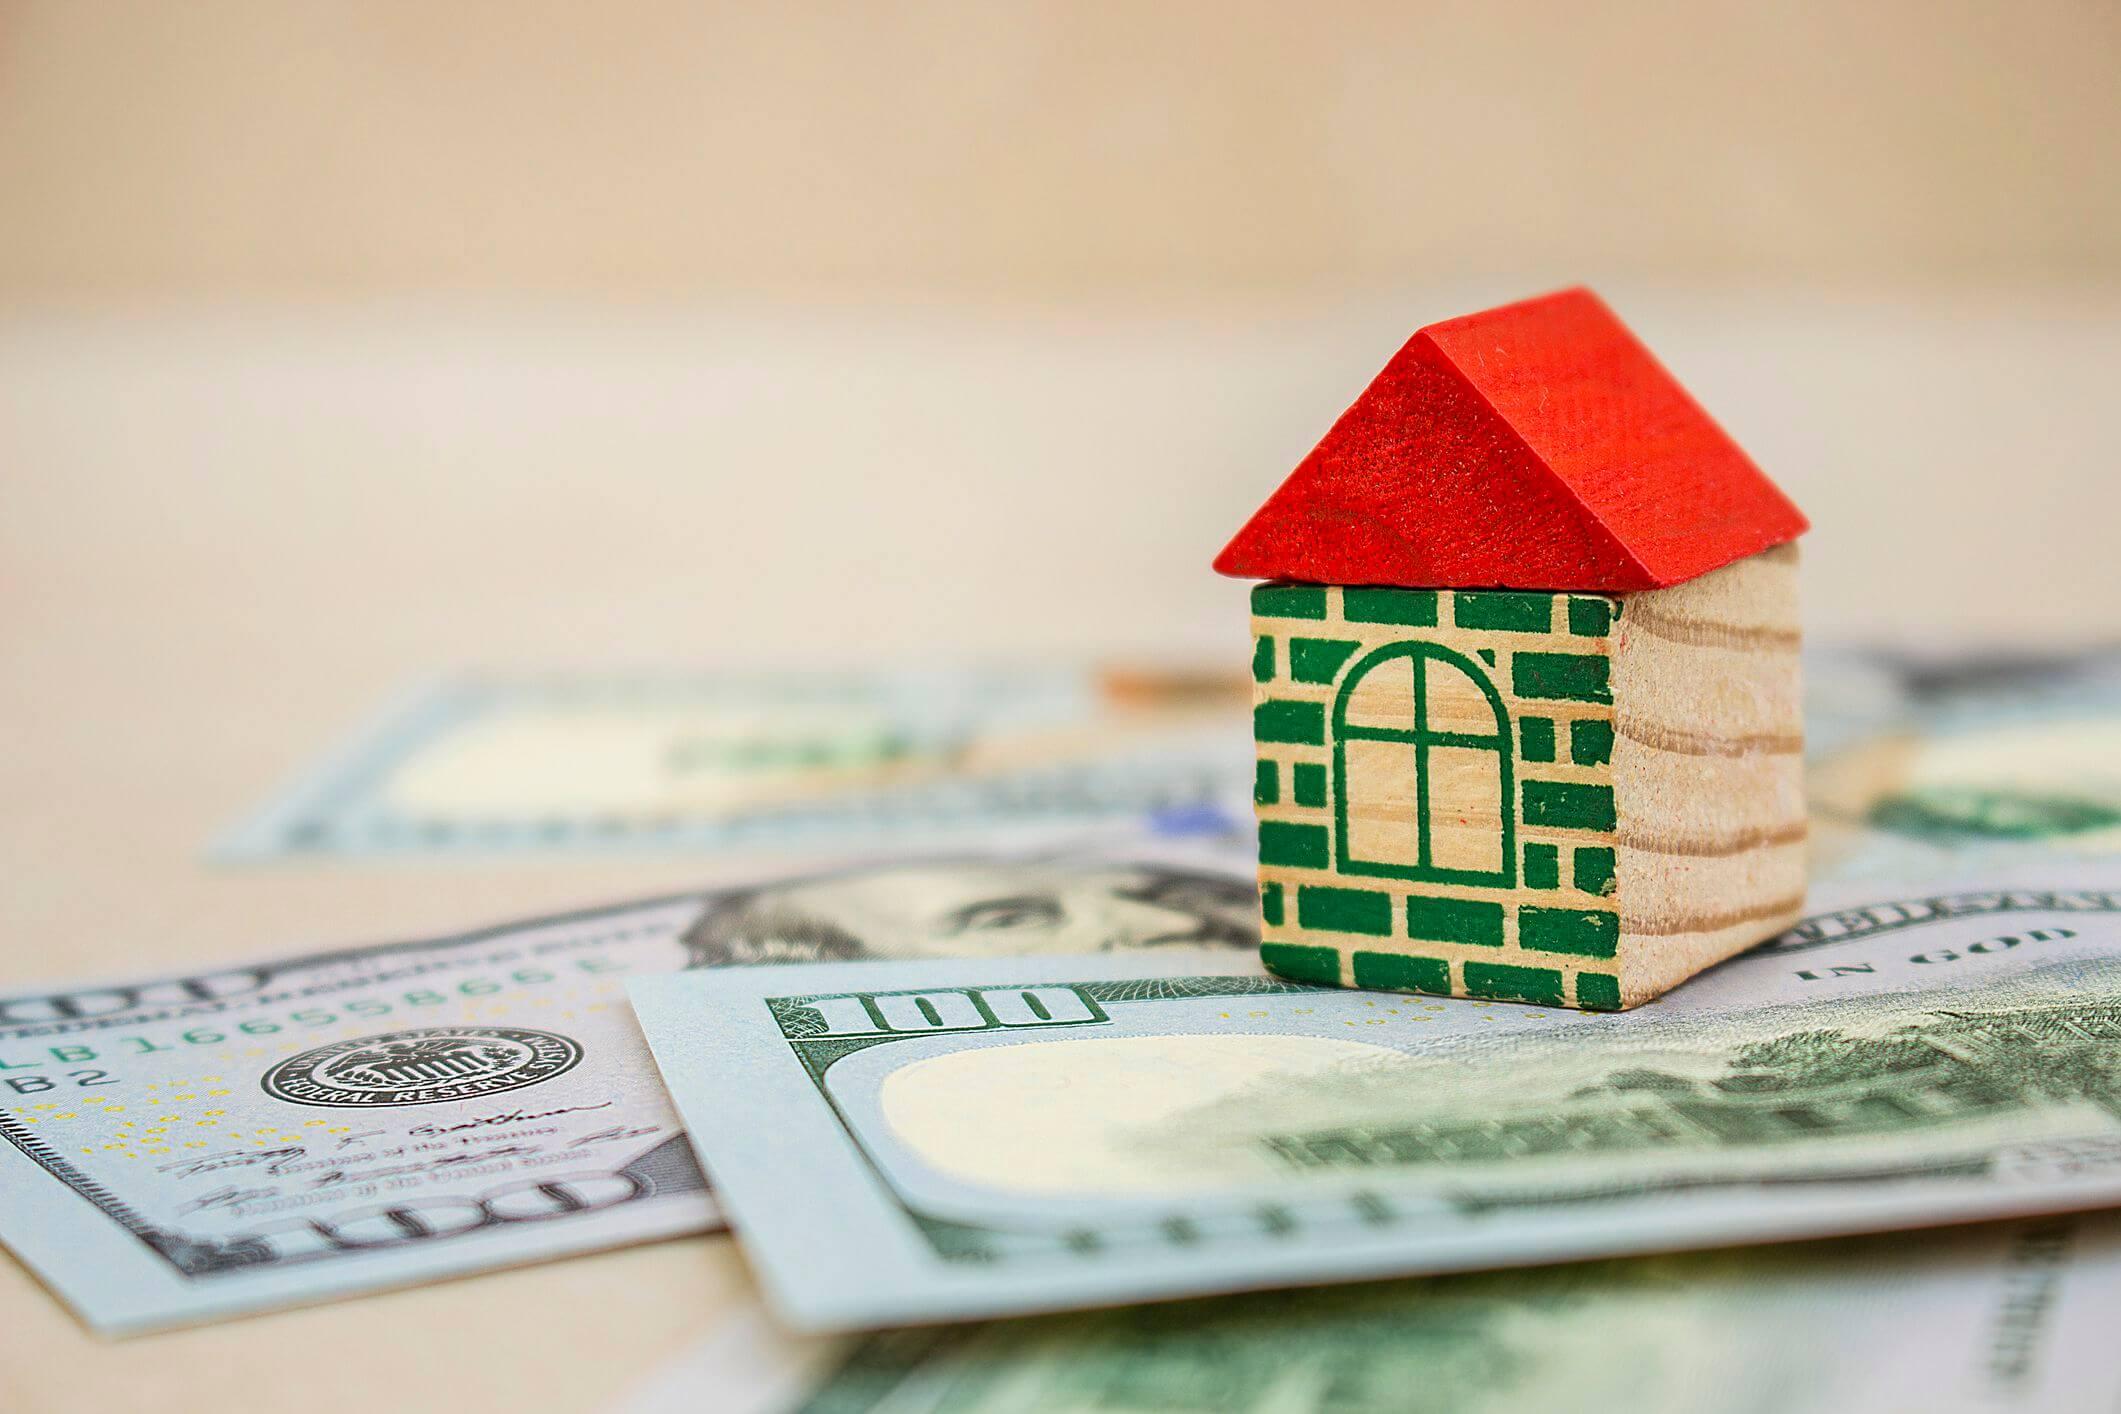 Mini house on top of 100 dollar bills